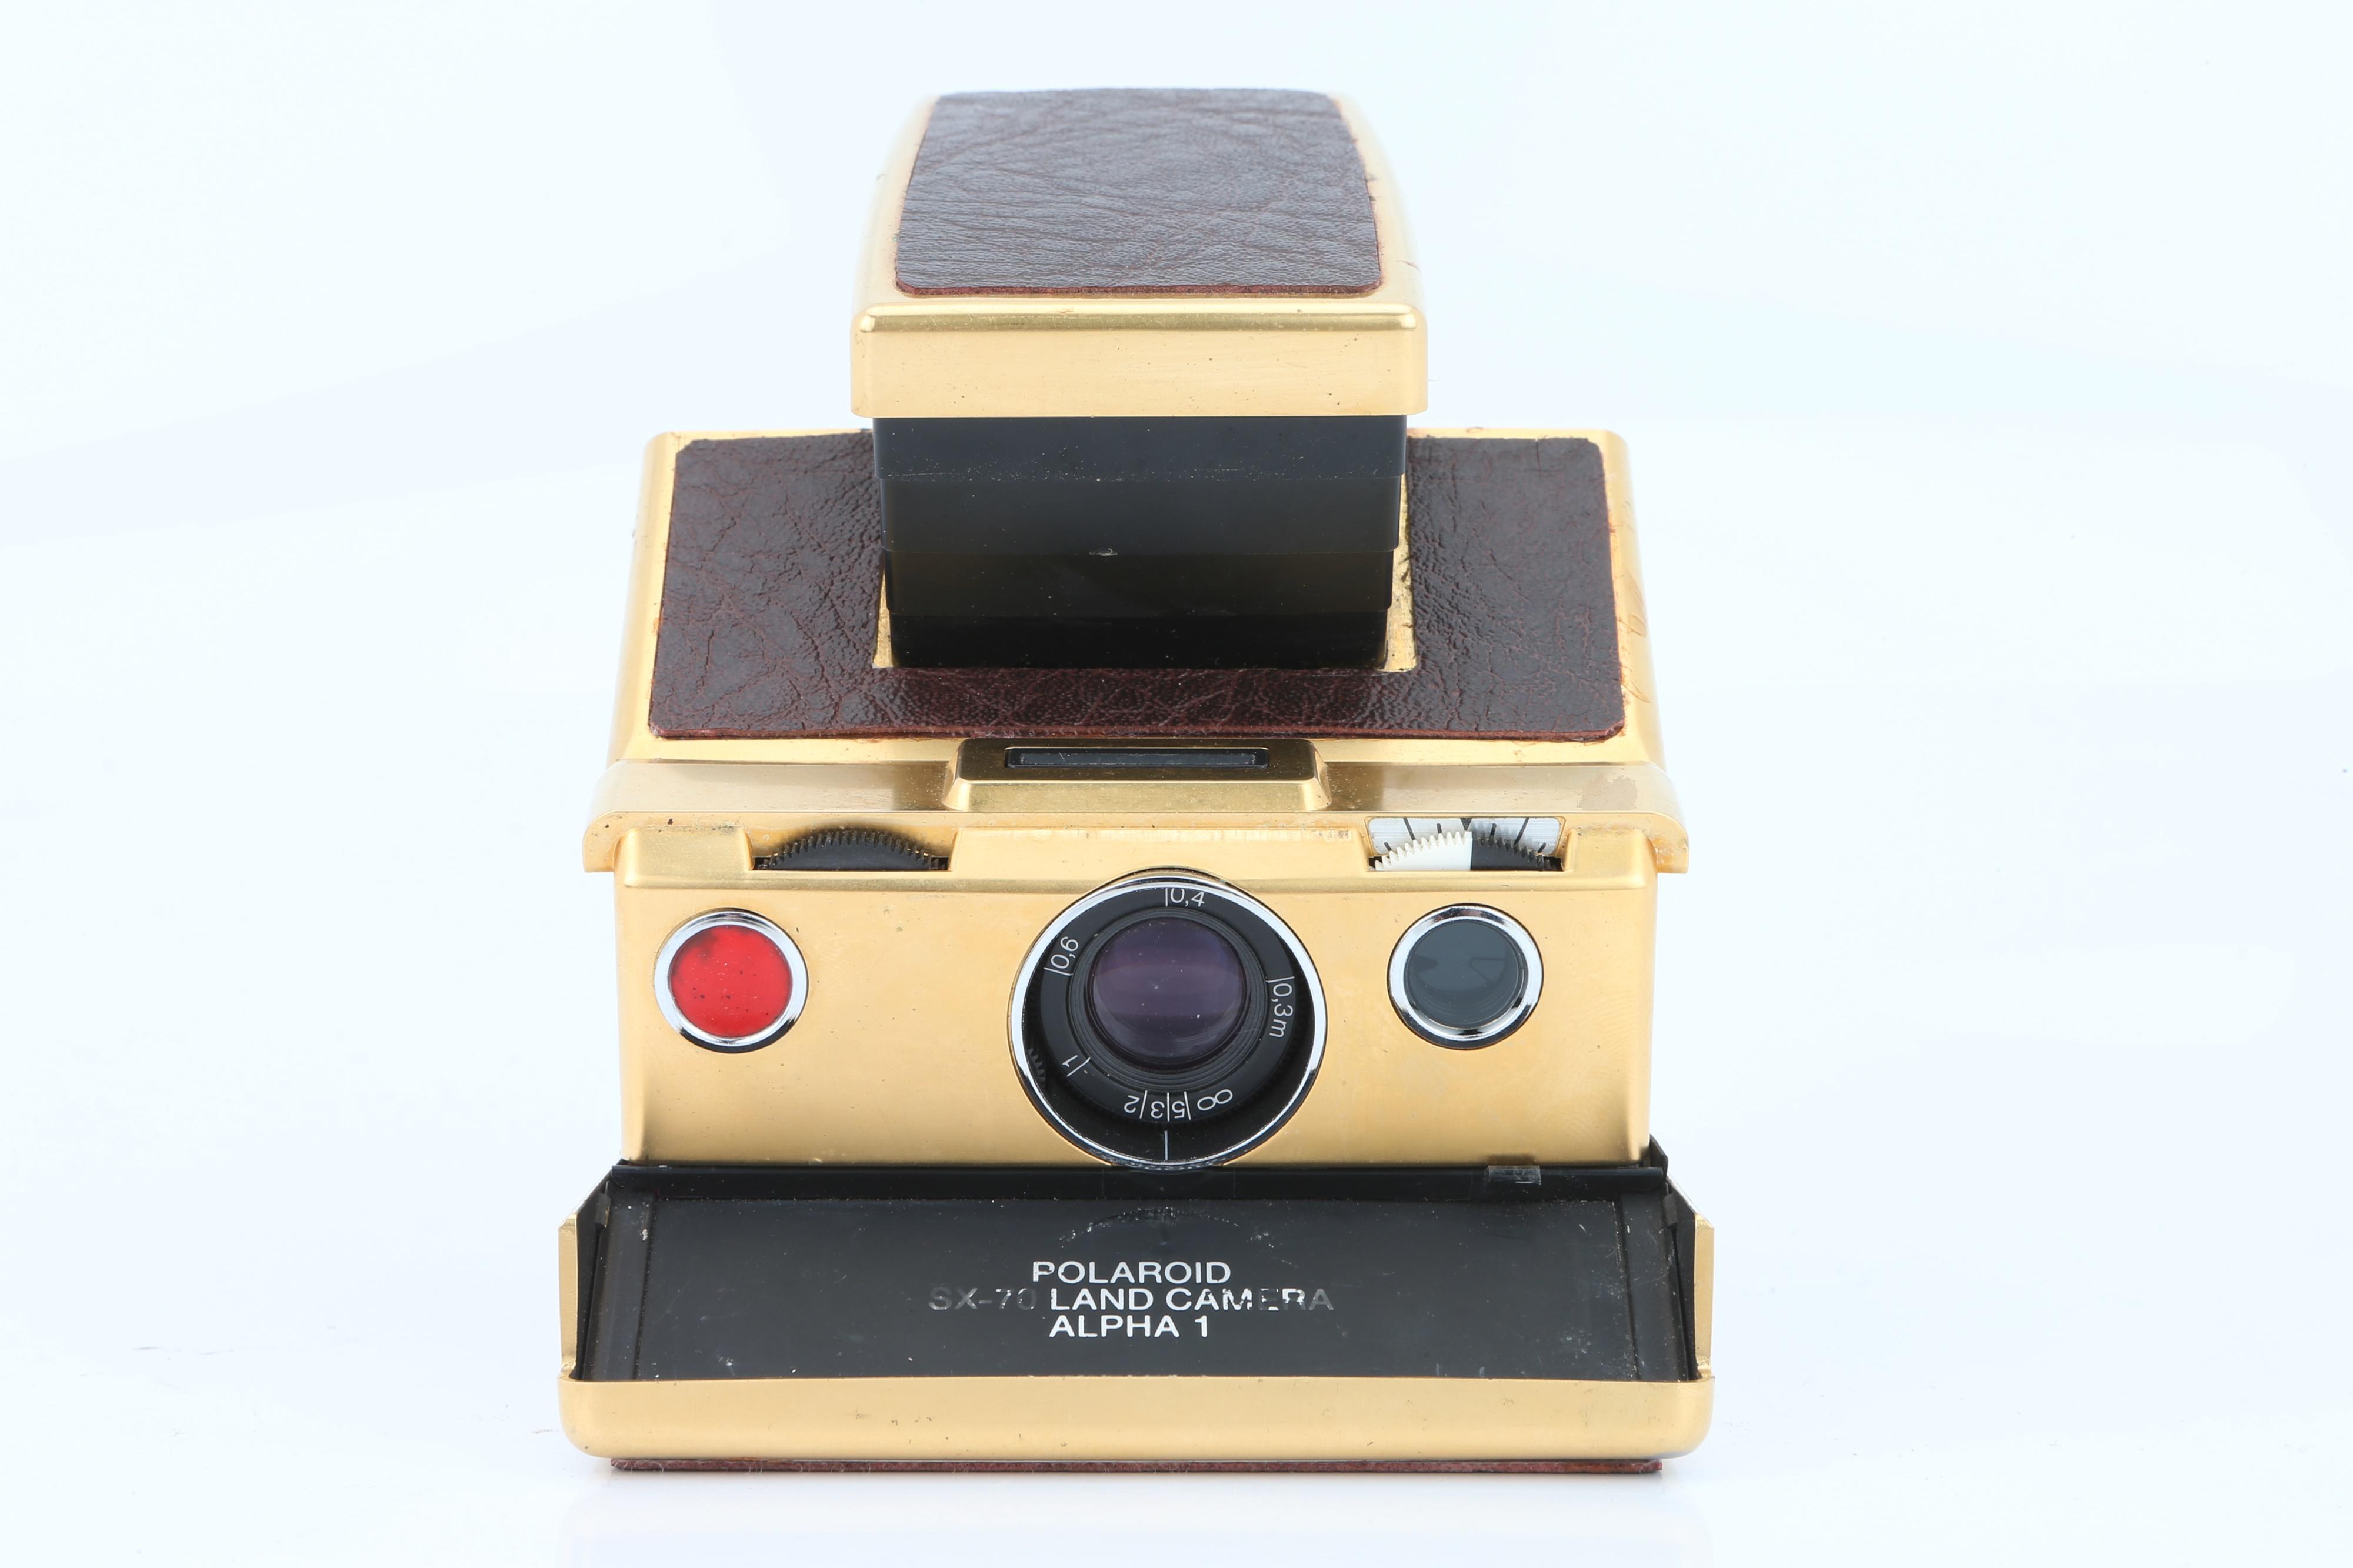 A Polaroid Land Camera SX-70 Alpha 1, - Image 2 of 8